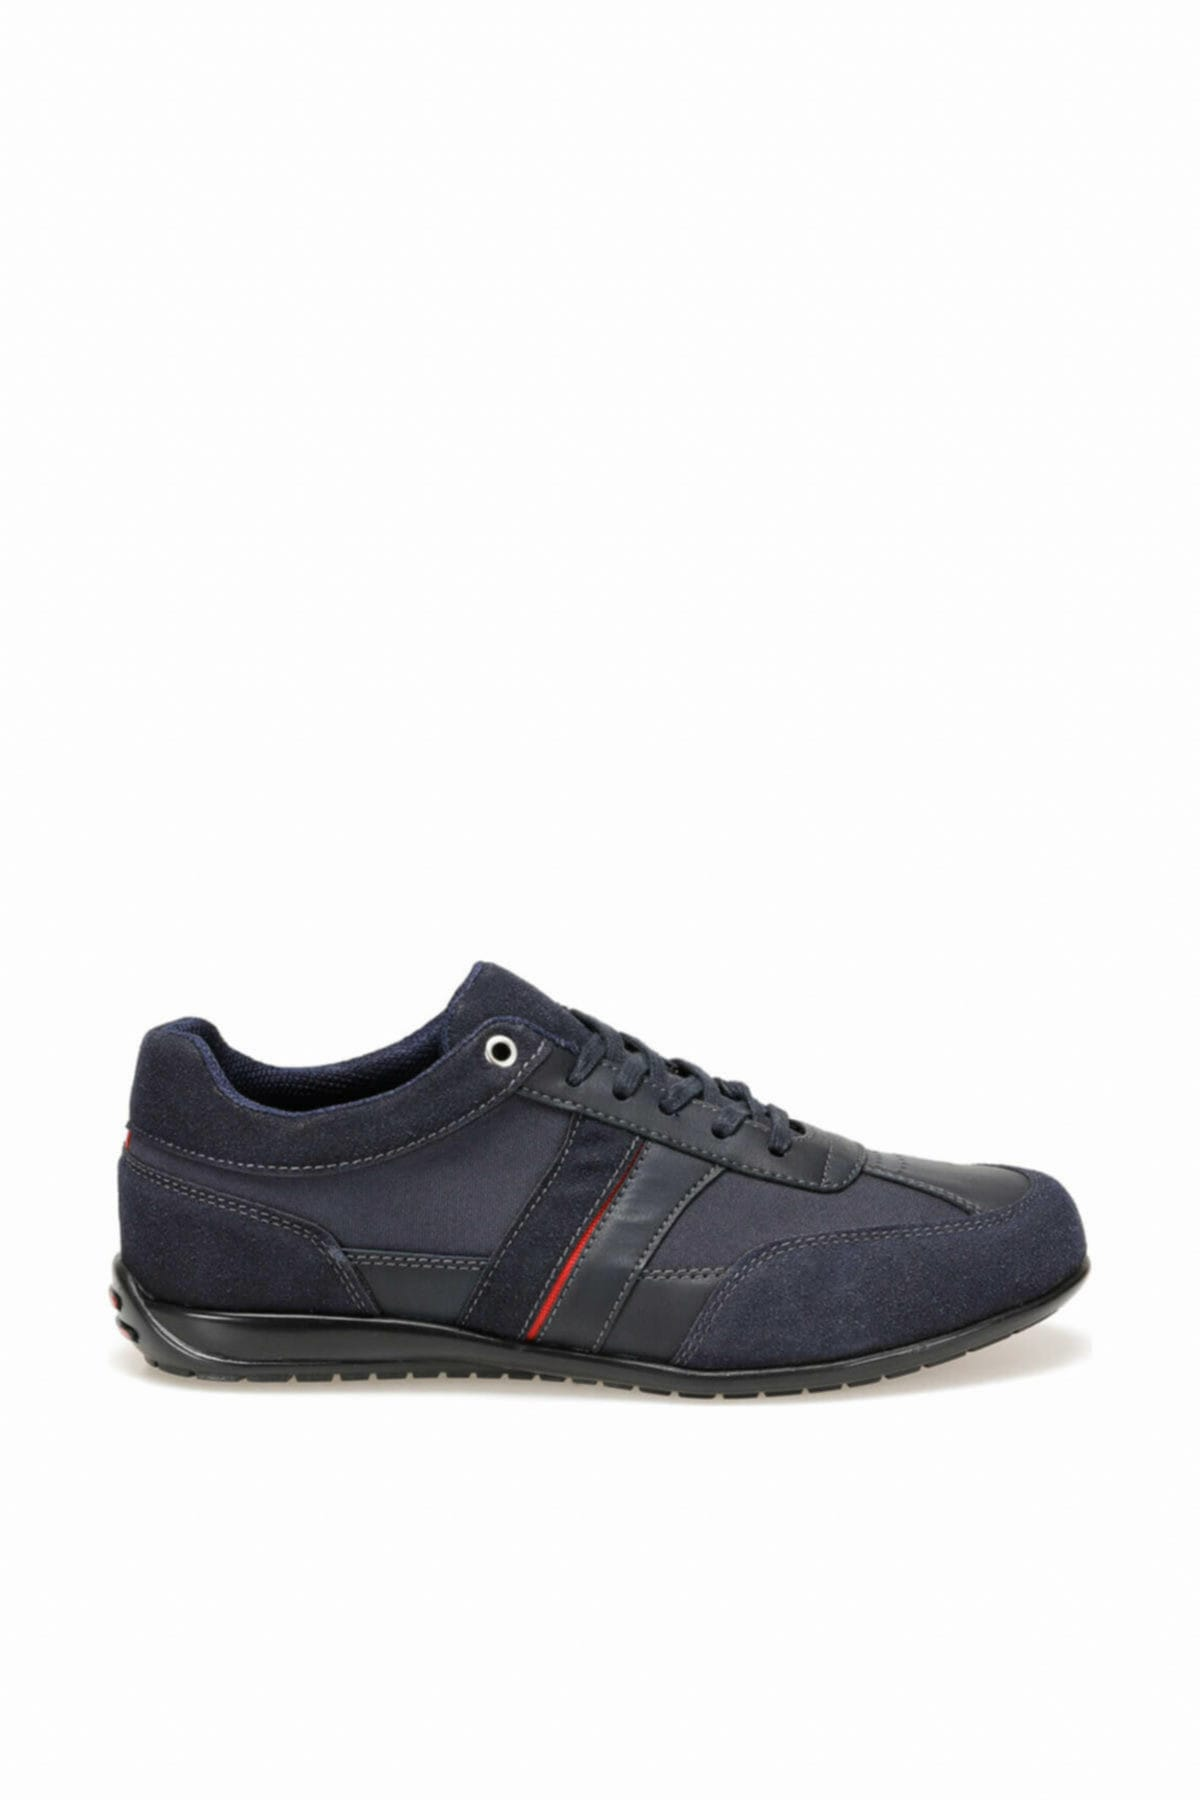 OXIDE NAVIA C Lacivert Erkek Sneaker Ayakkabı 100349396 2